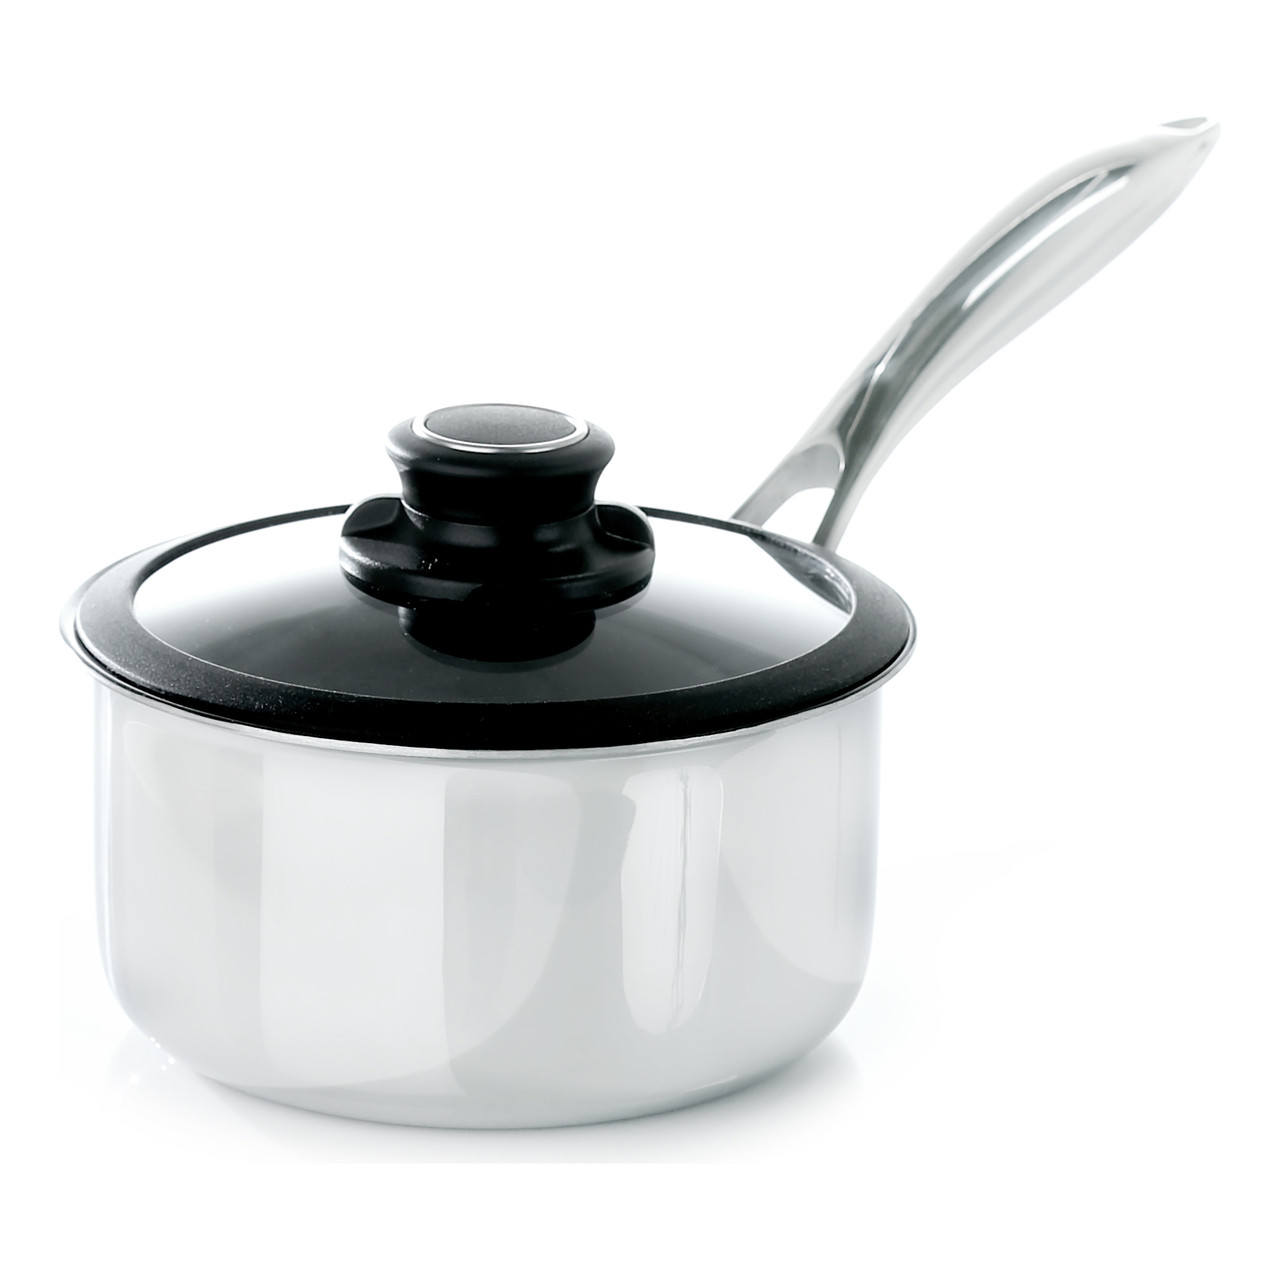 "Black Cube Saucepan w/ Lid, 8"" dia., 2.5 qt."